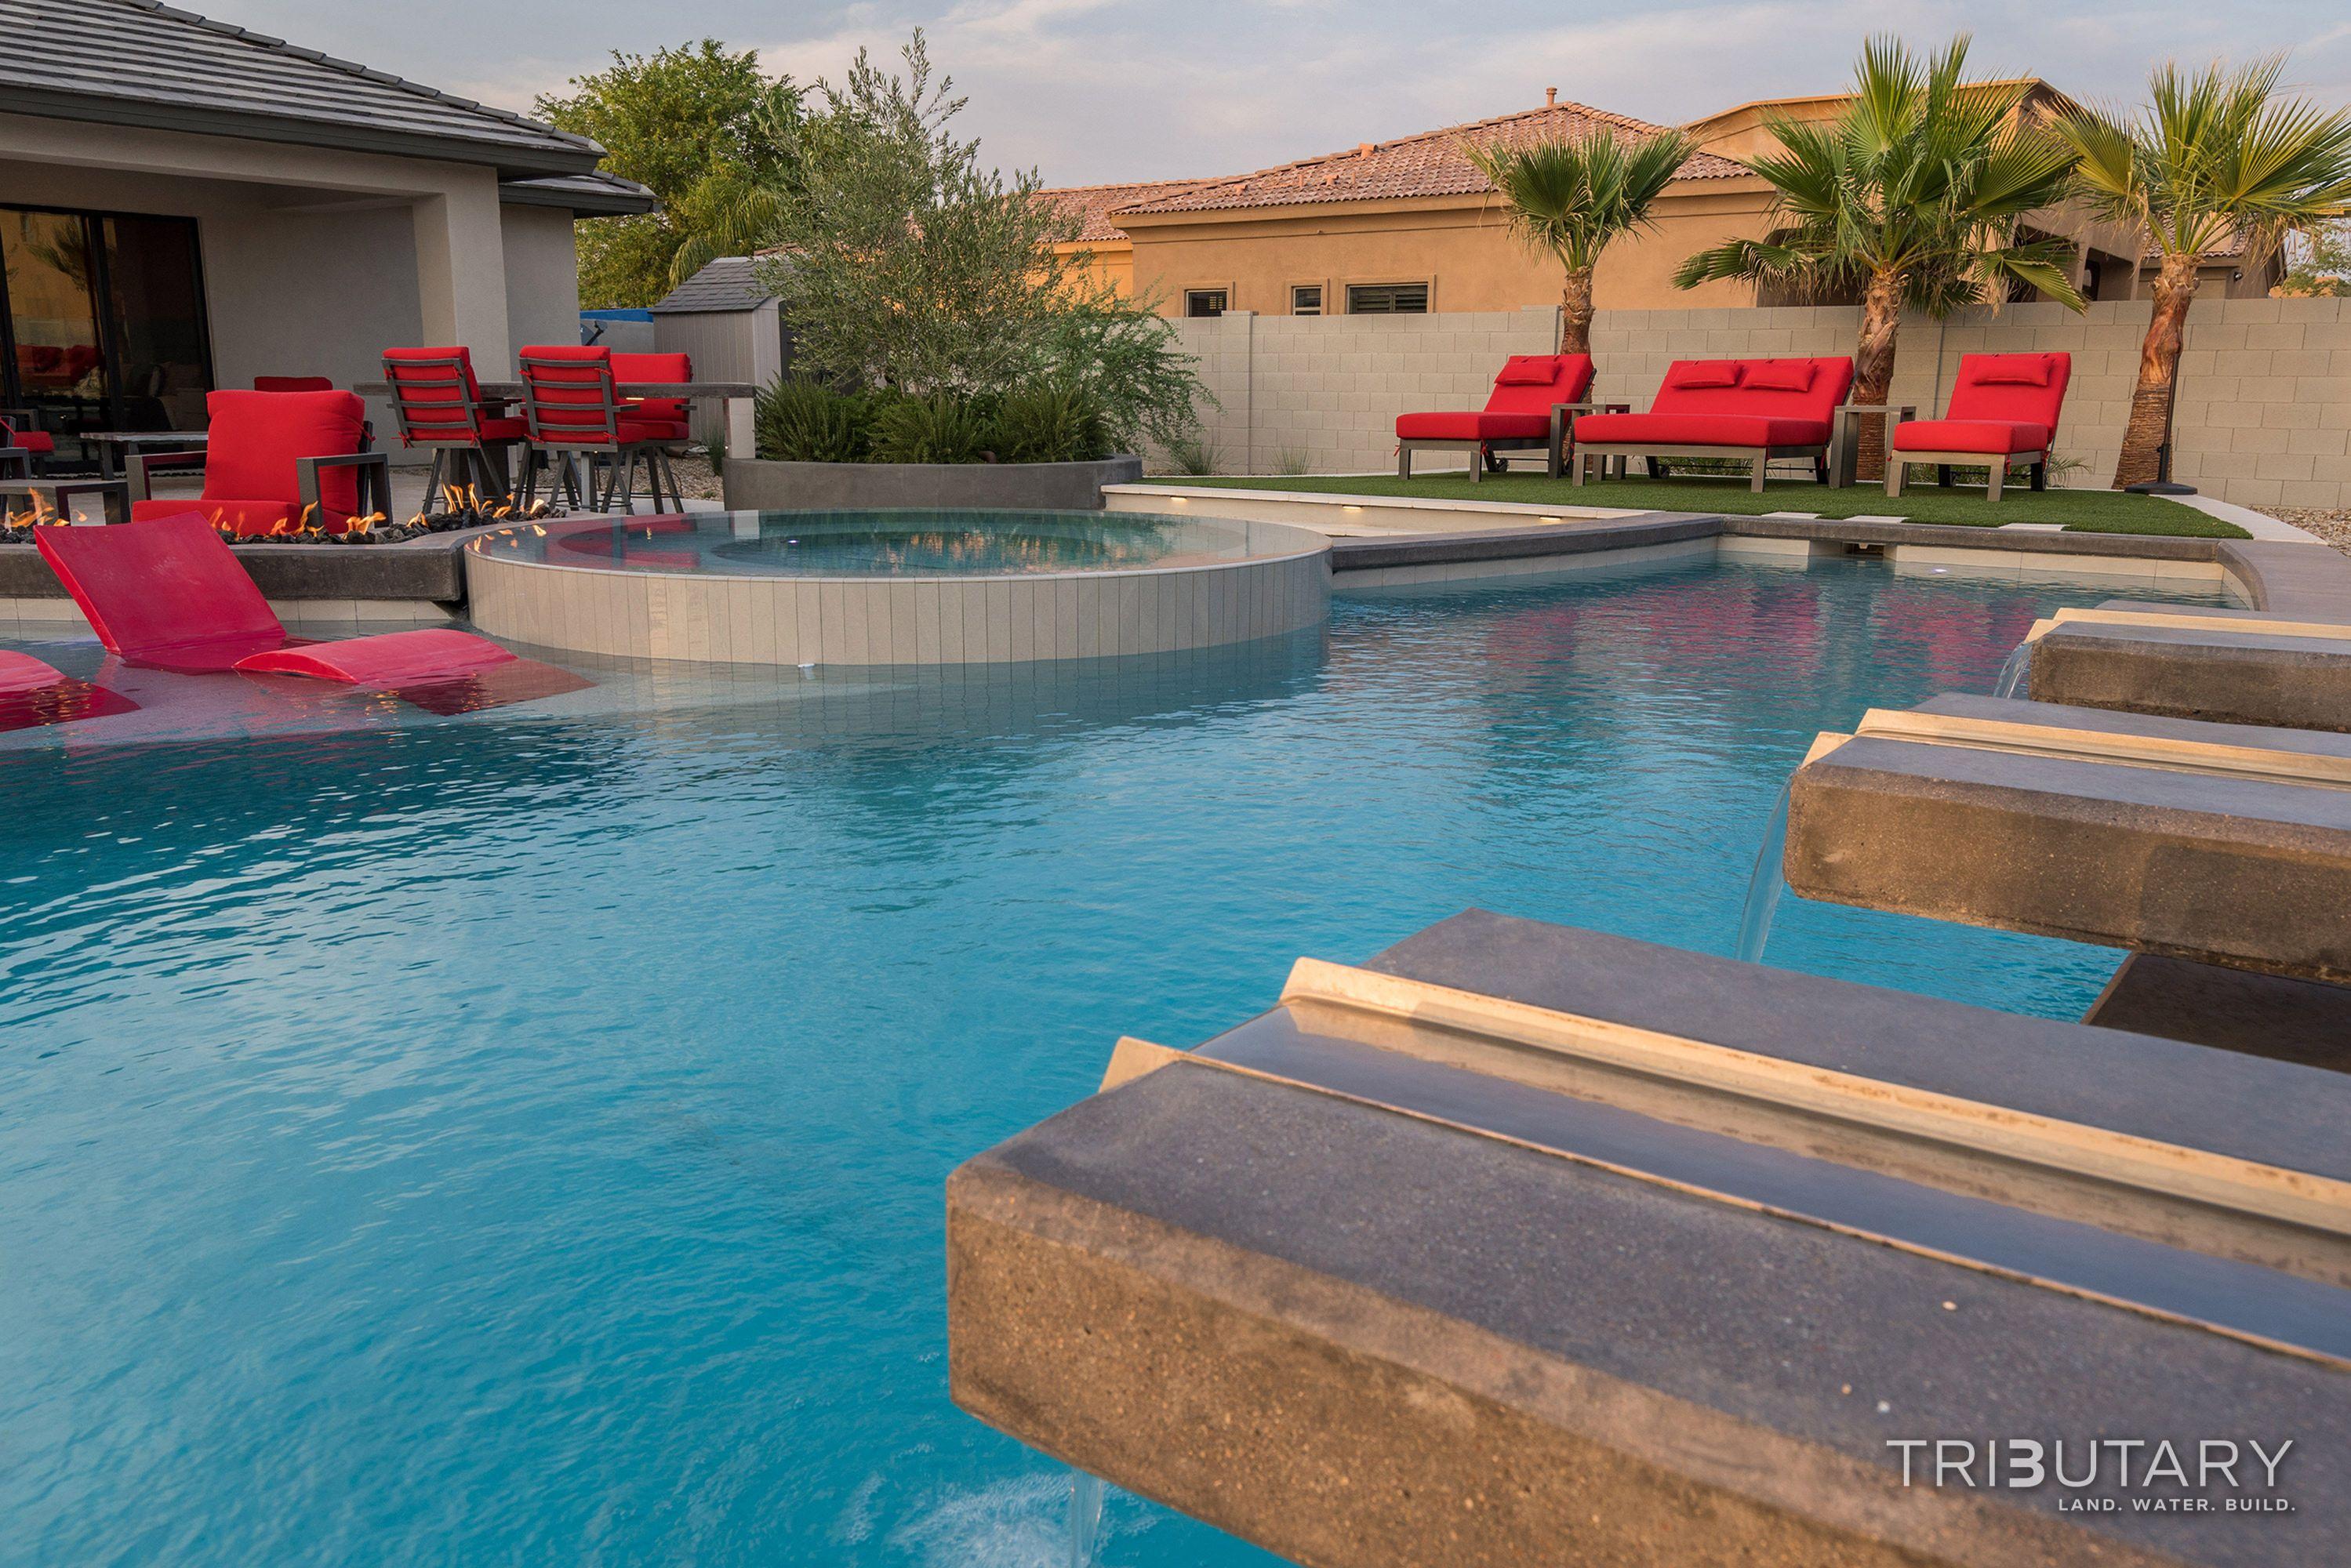 Tributary Pools Custom Pool Sleek Oasis Gilbert Diy Network Pool Kings Gilbert Arizona Paradise Luxury Pool Jeromey Naugle Watersh Pool Kings Custom Pools Pool